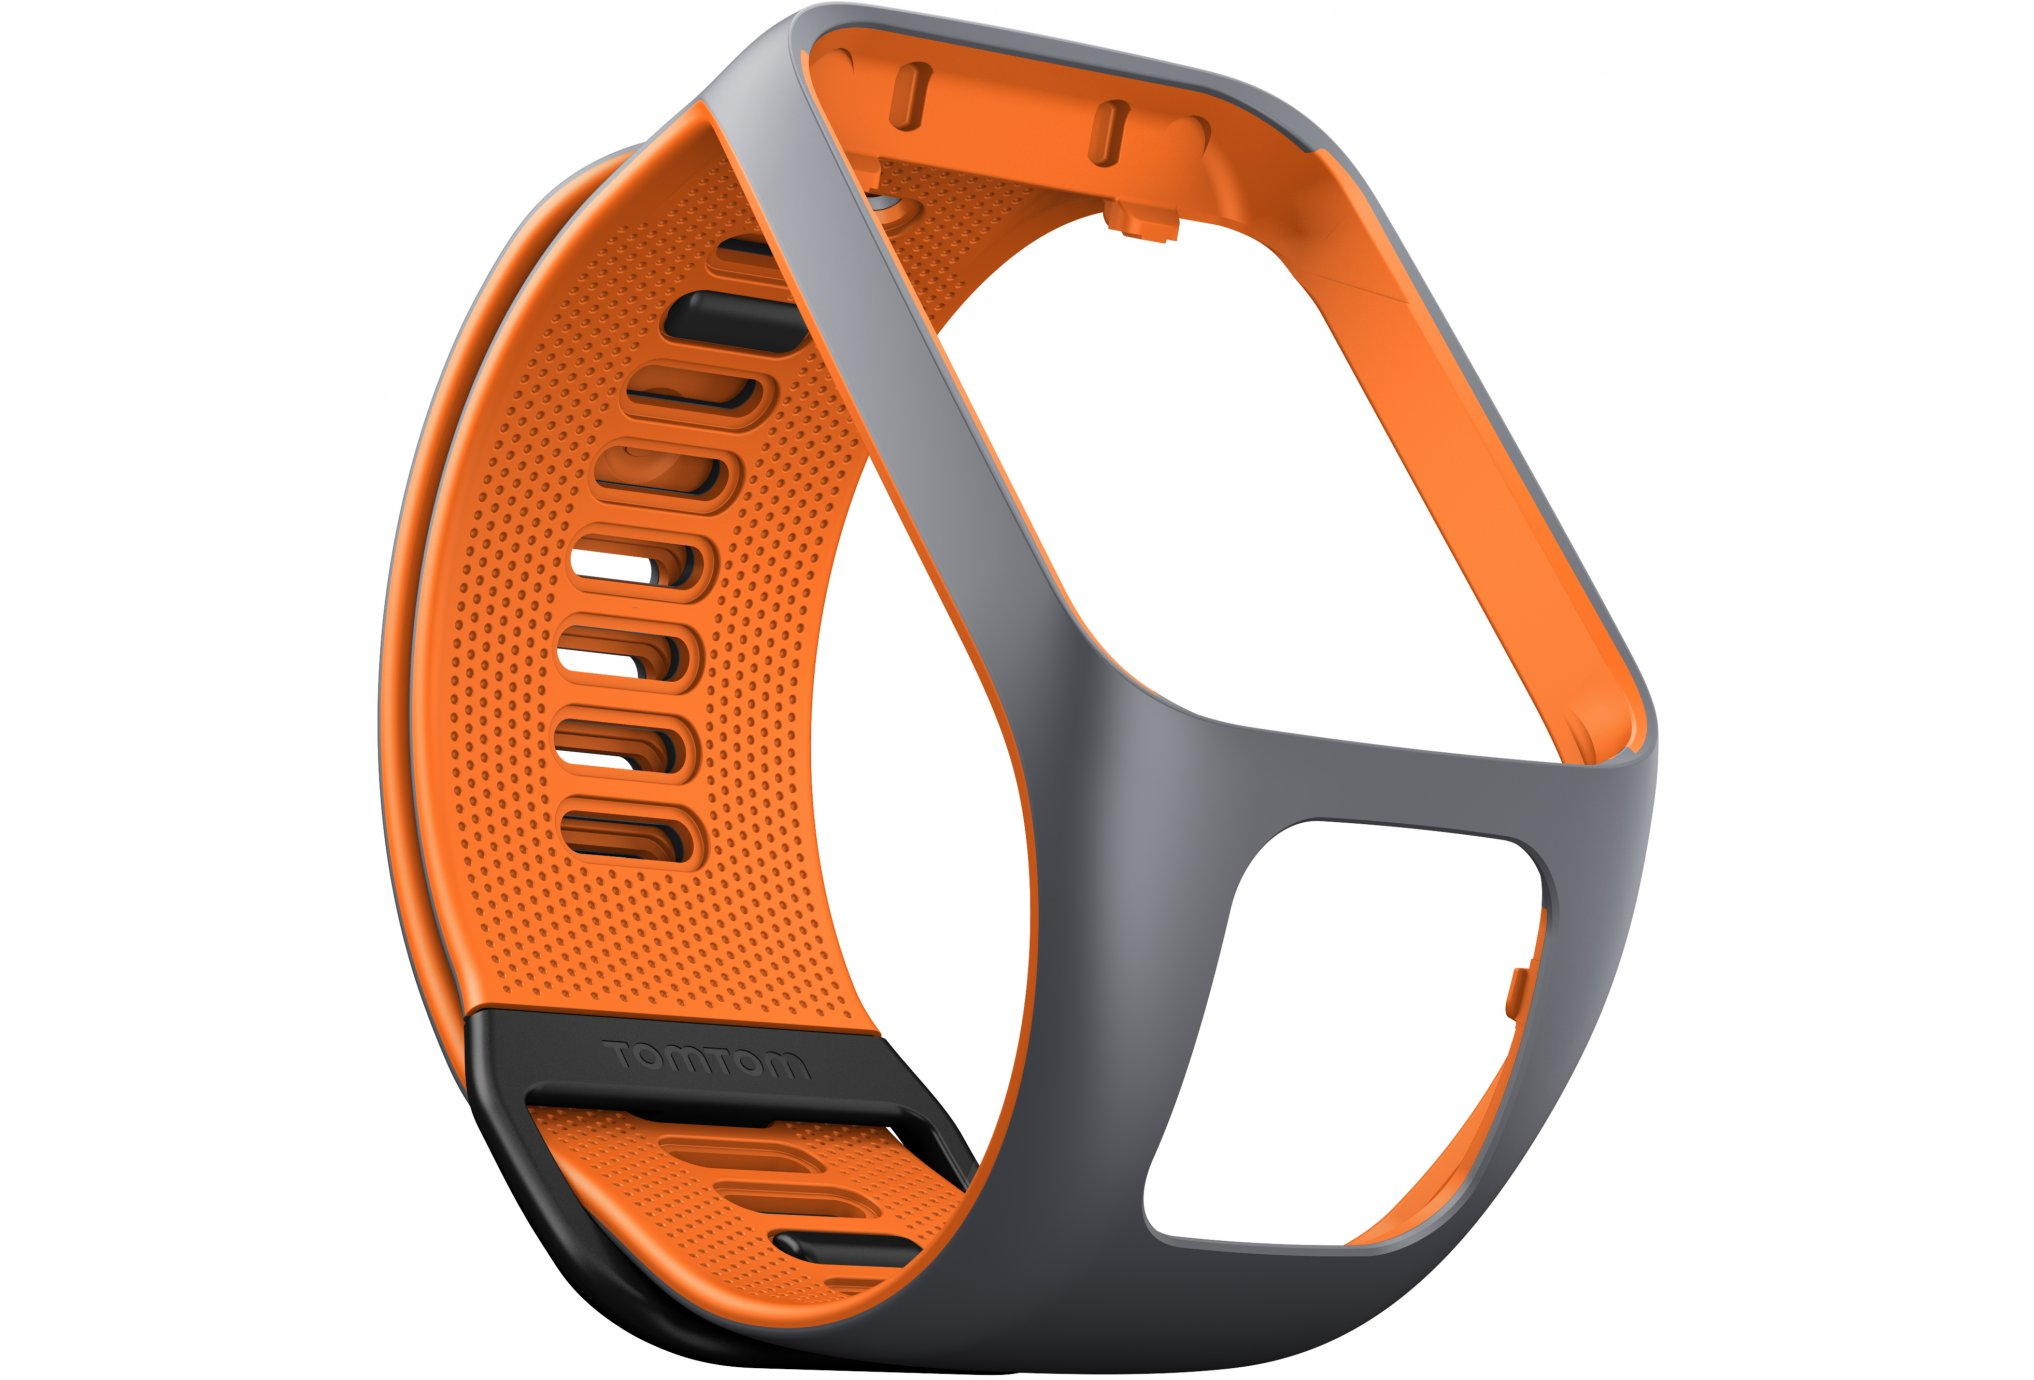 Tomtom Bracelet montre runner 3/adventurer - large accessoires montres/ bracelets